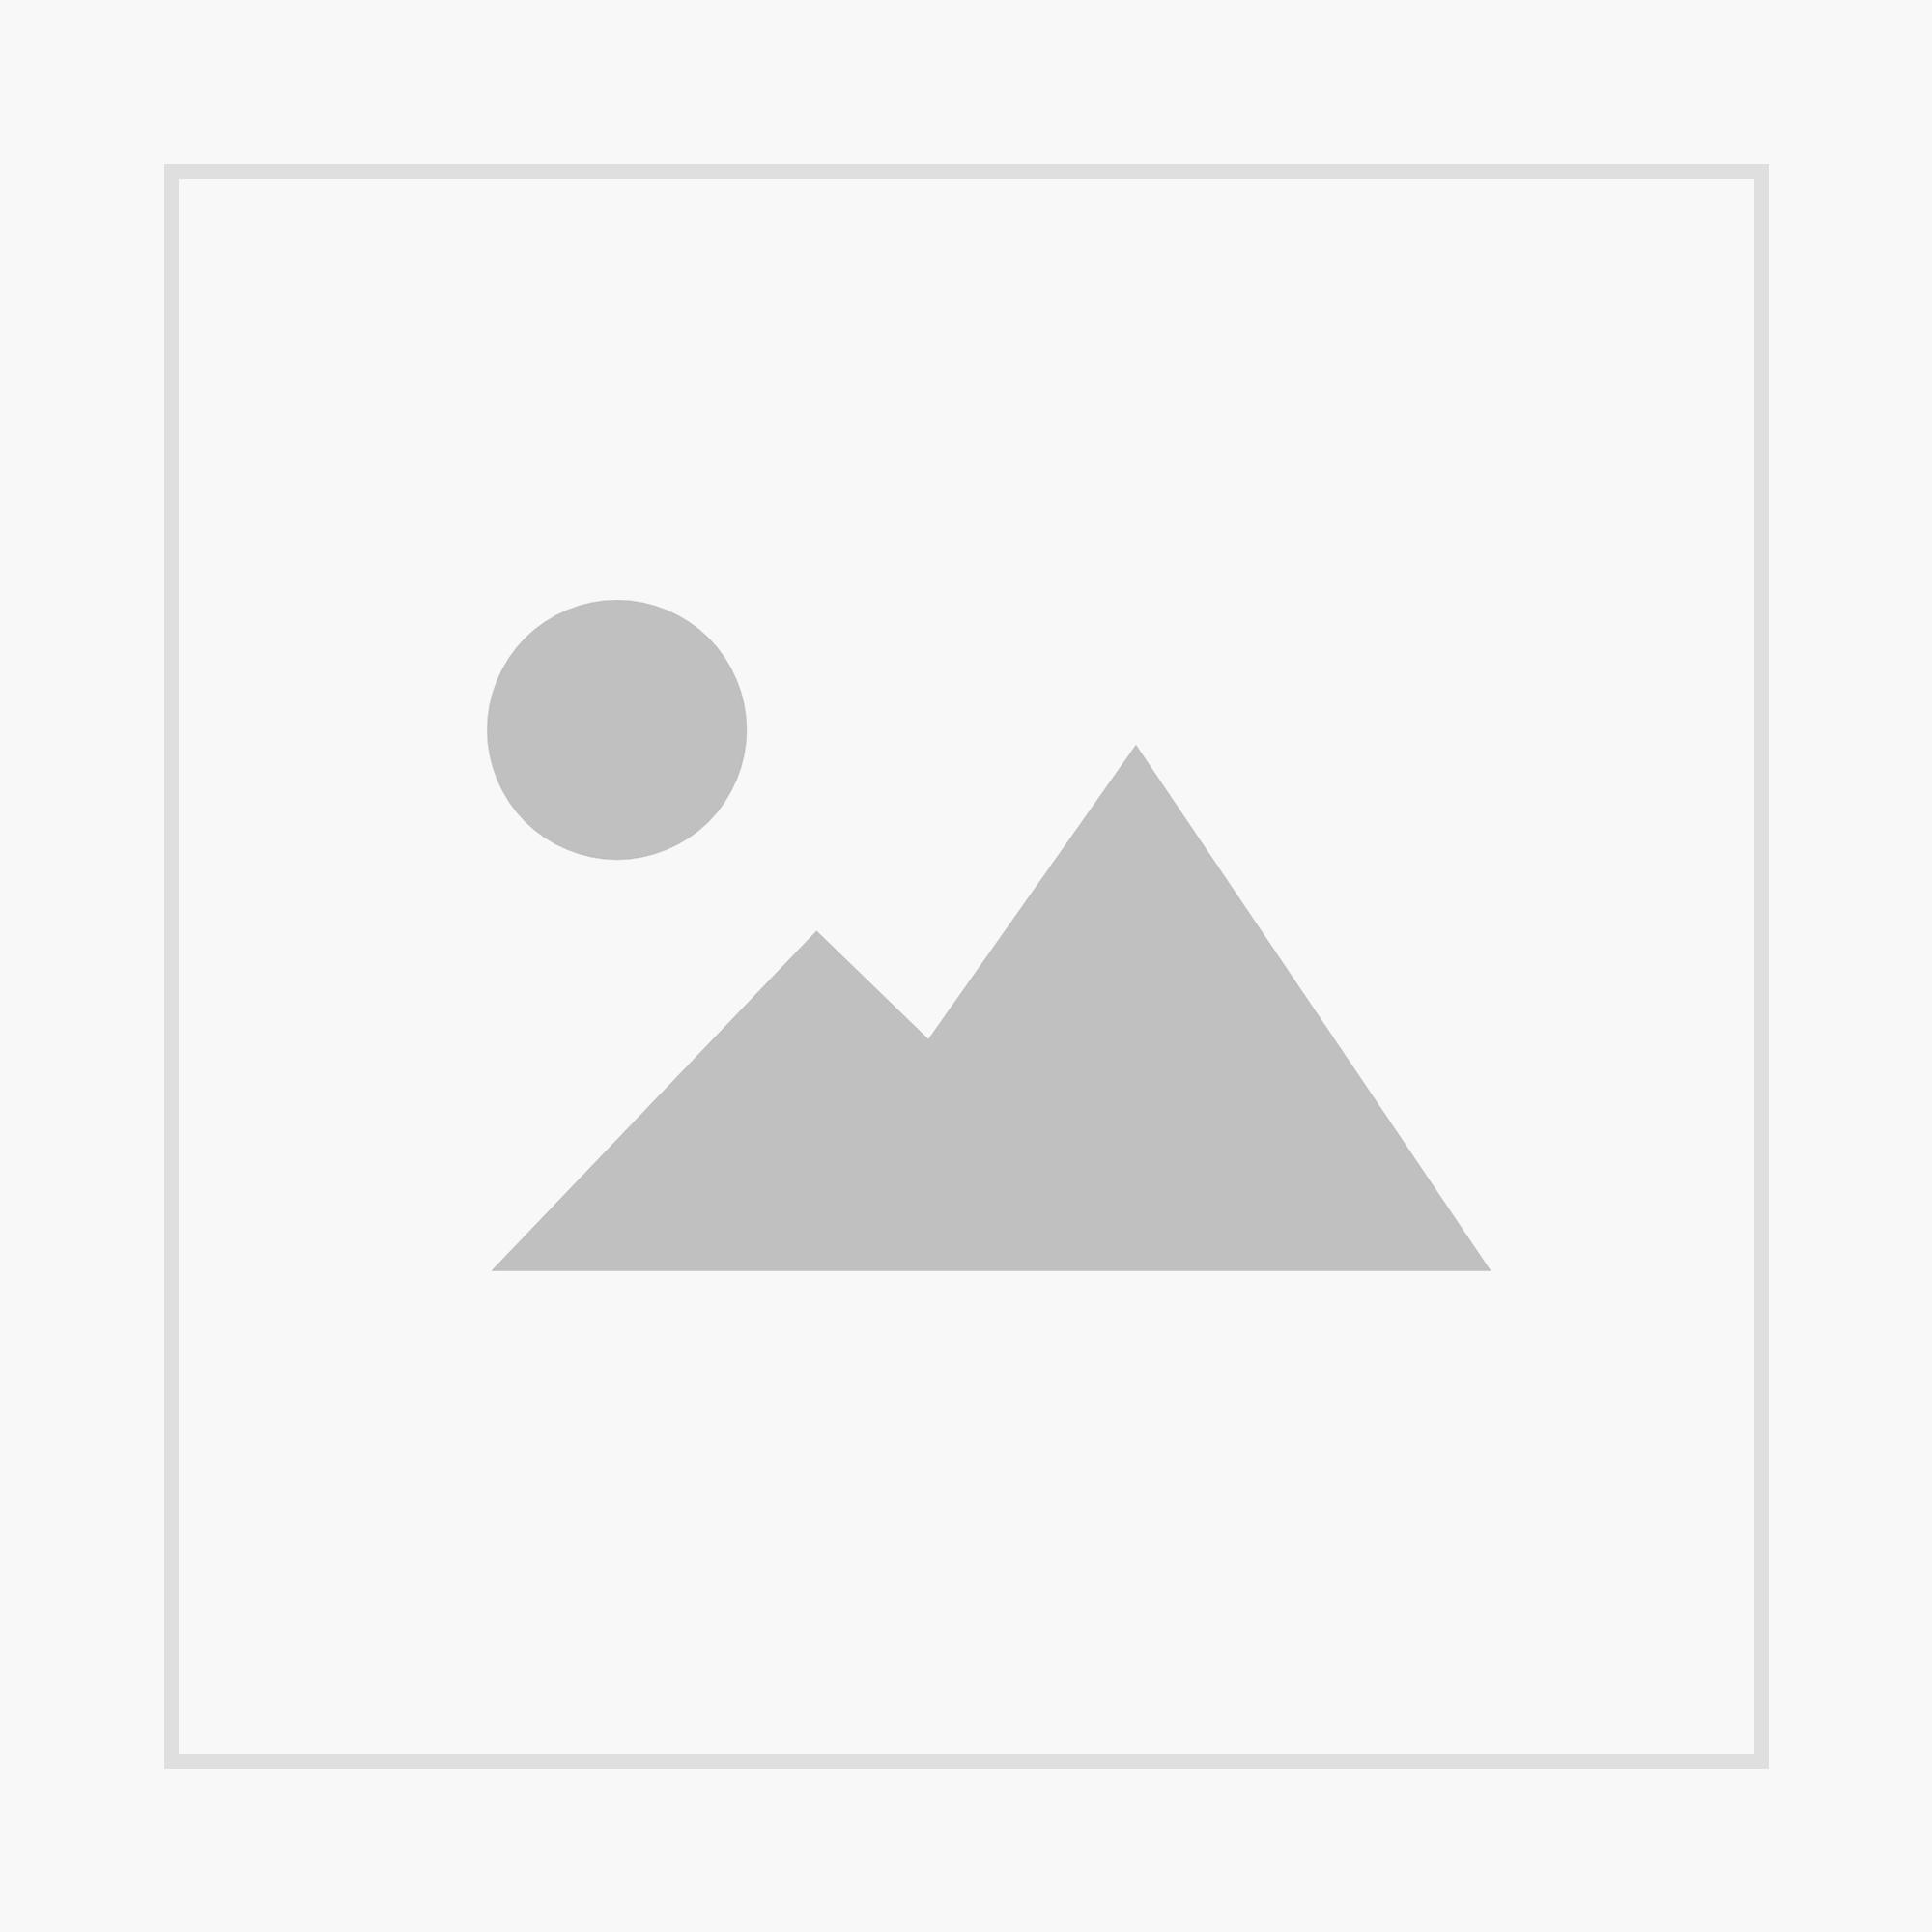 Land & Berge 3/2018